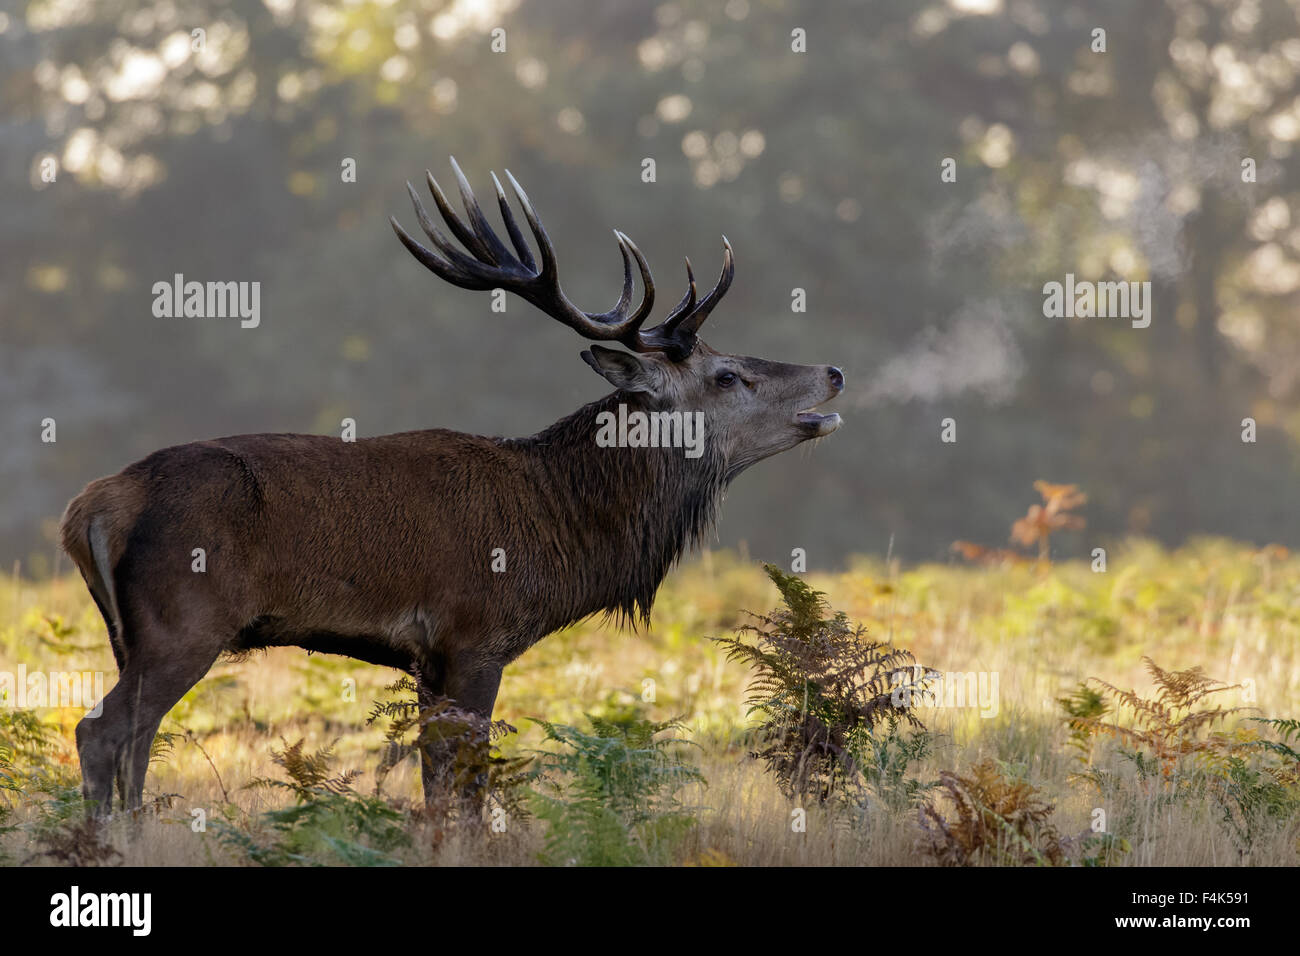 Red Deer rut stag (Cervus elaphus) roaring on a chilly morning. - Stock Image